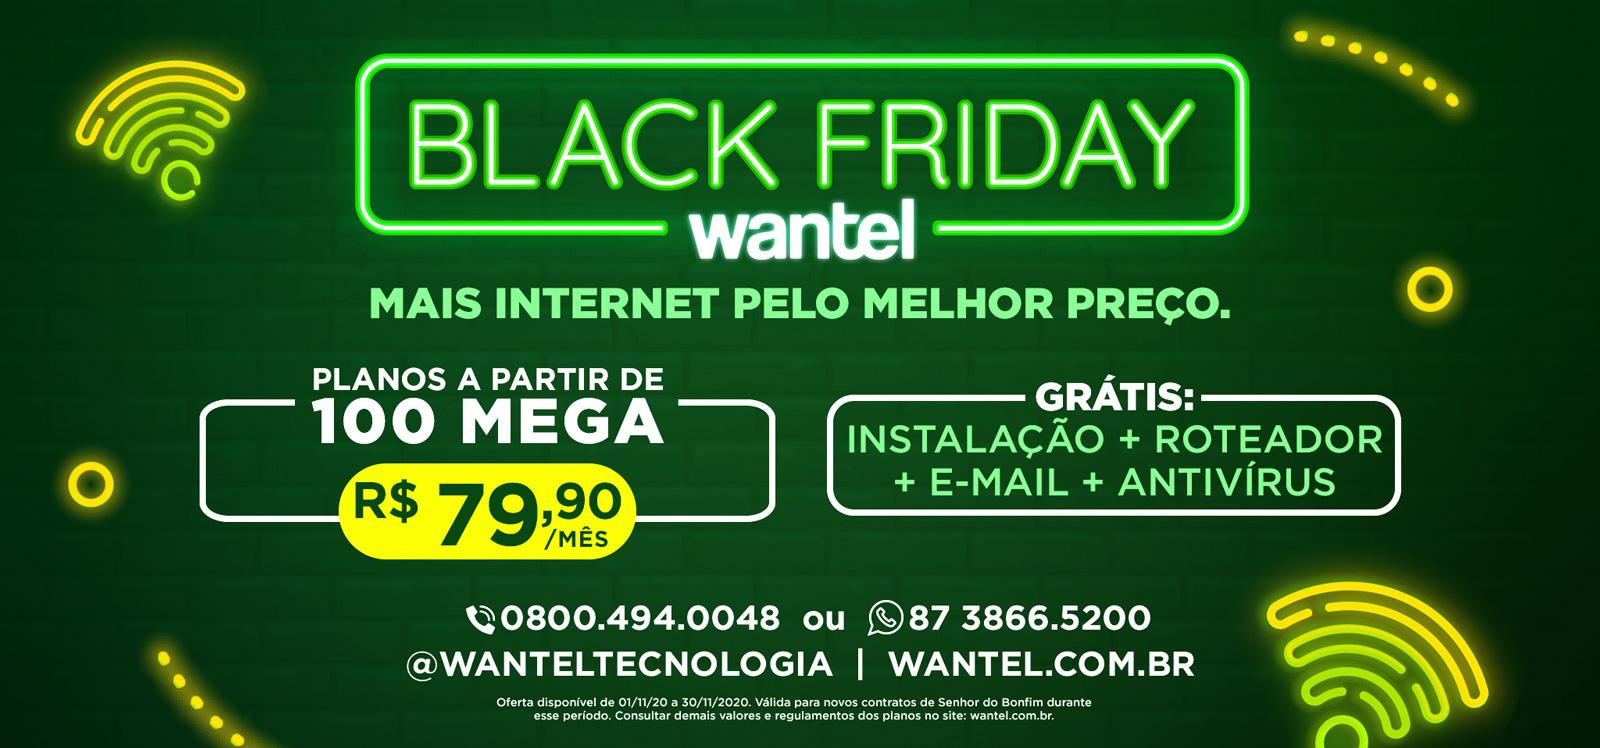 BlackFriday Wantel